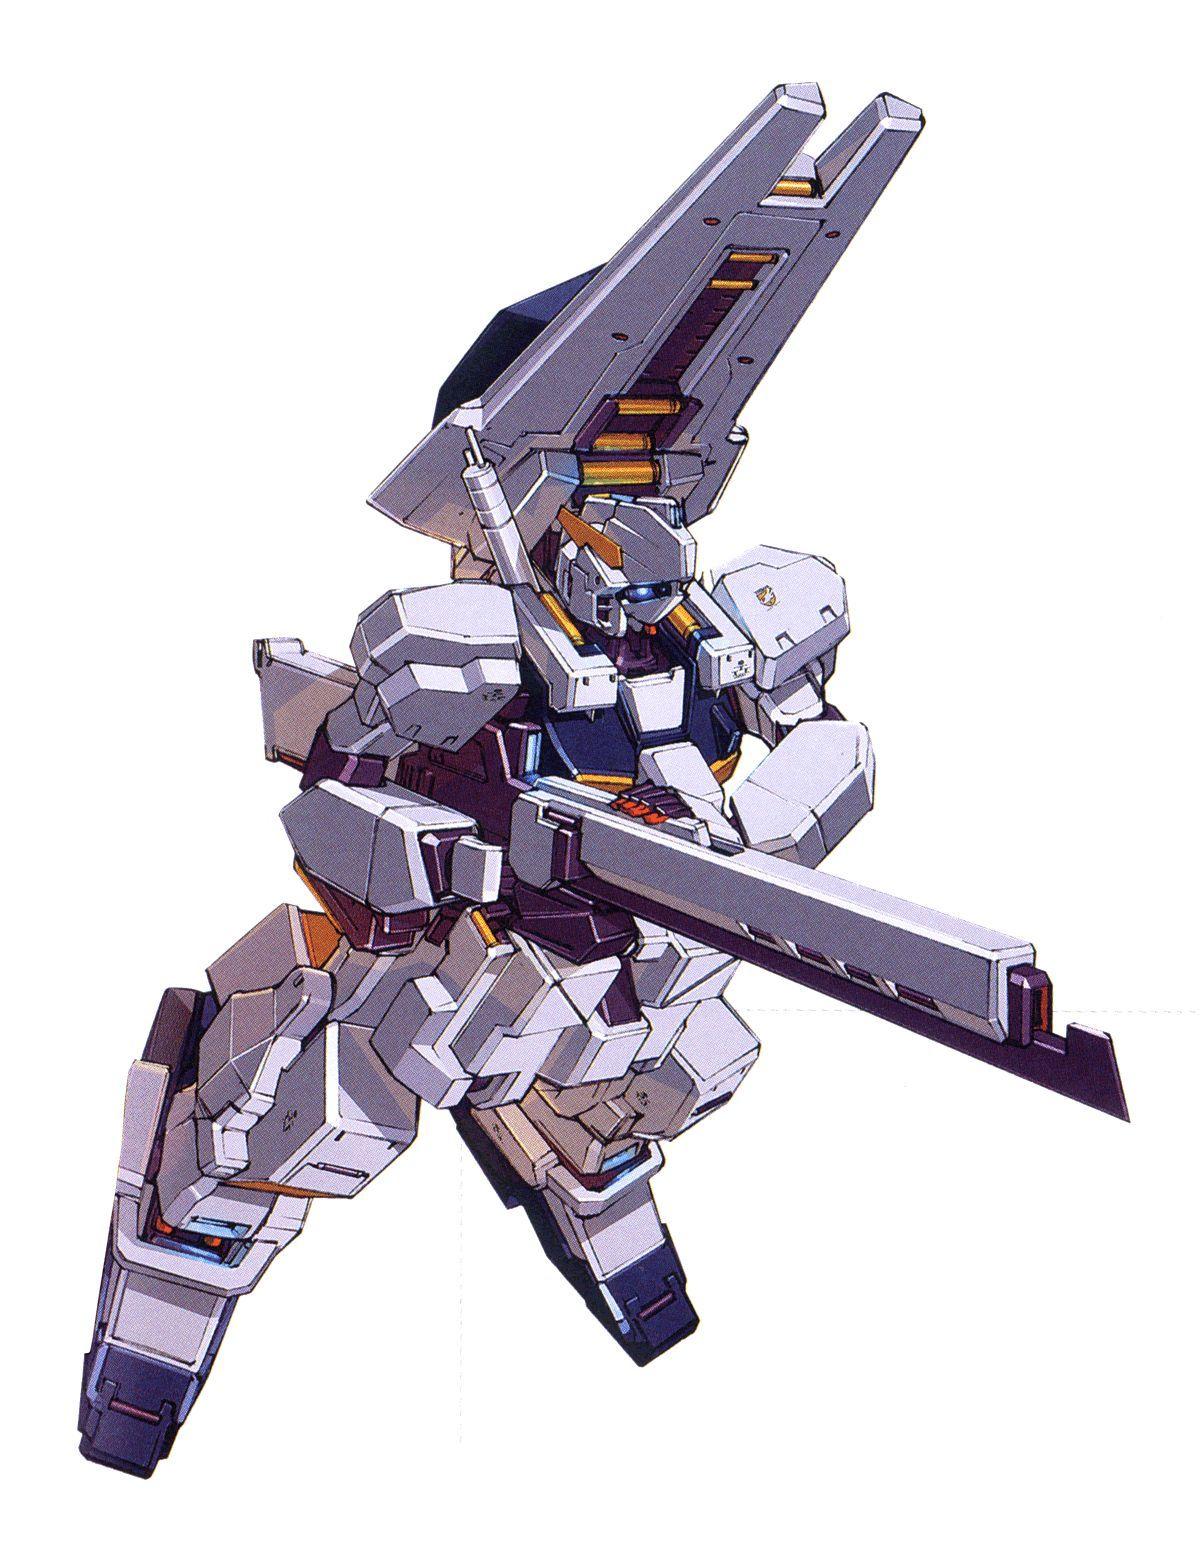 RX-121-1高达TR-1·海兹尔改狙击组件装备型